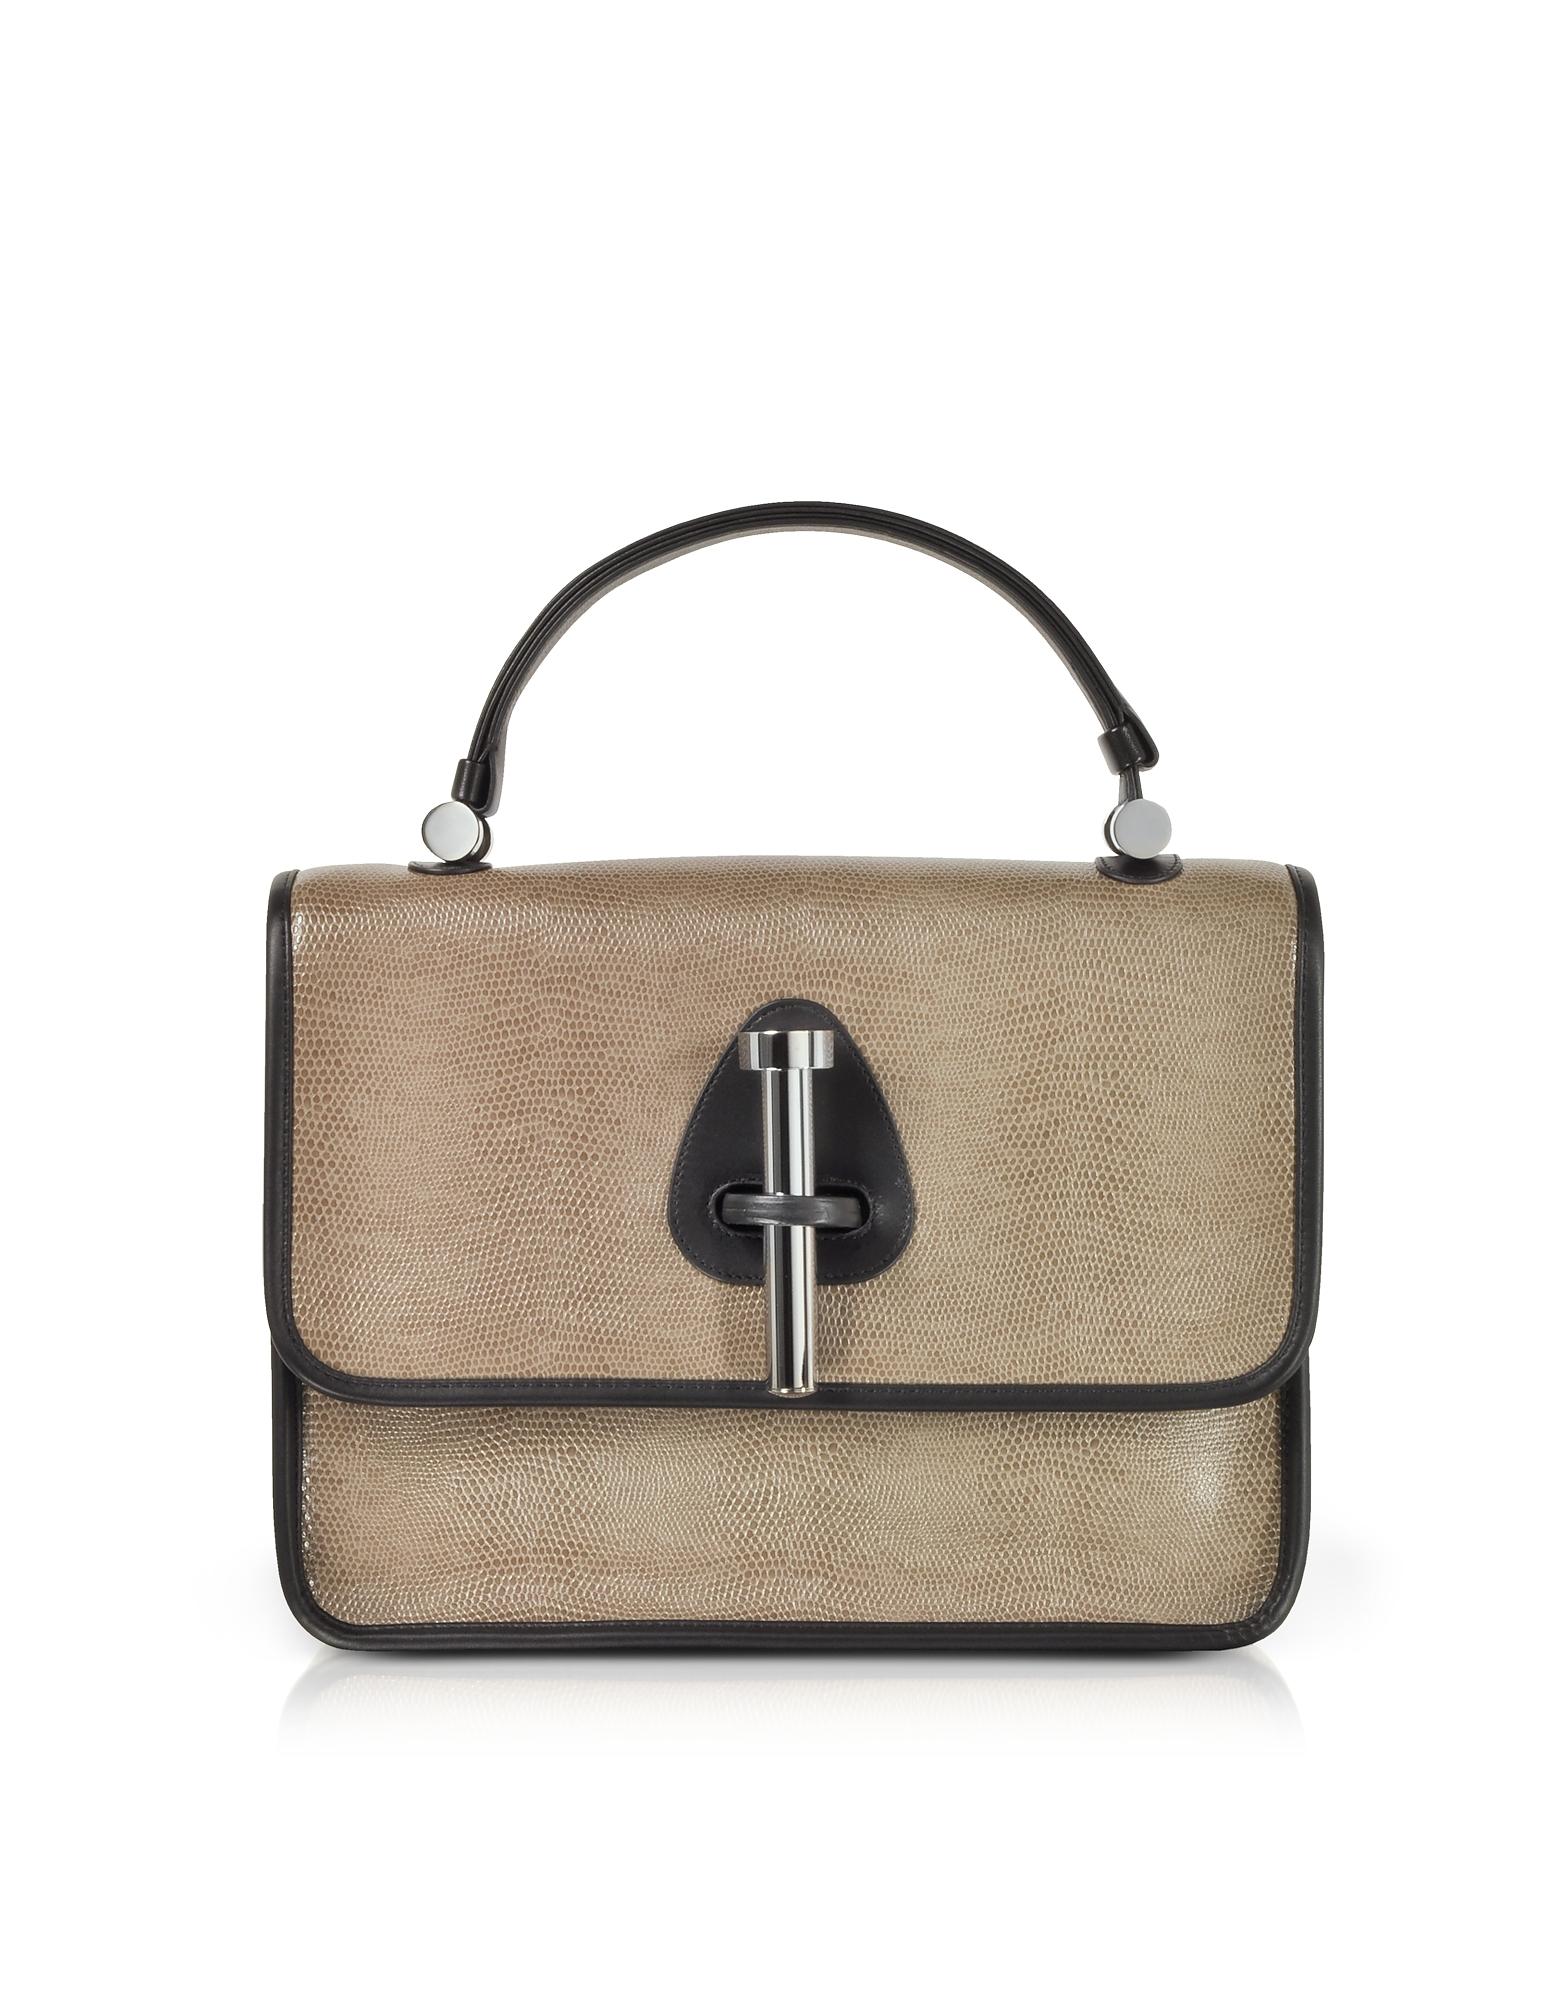 Rodo Handbags, Taupe Lizard Embossed Leather Satchel Bag